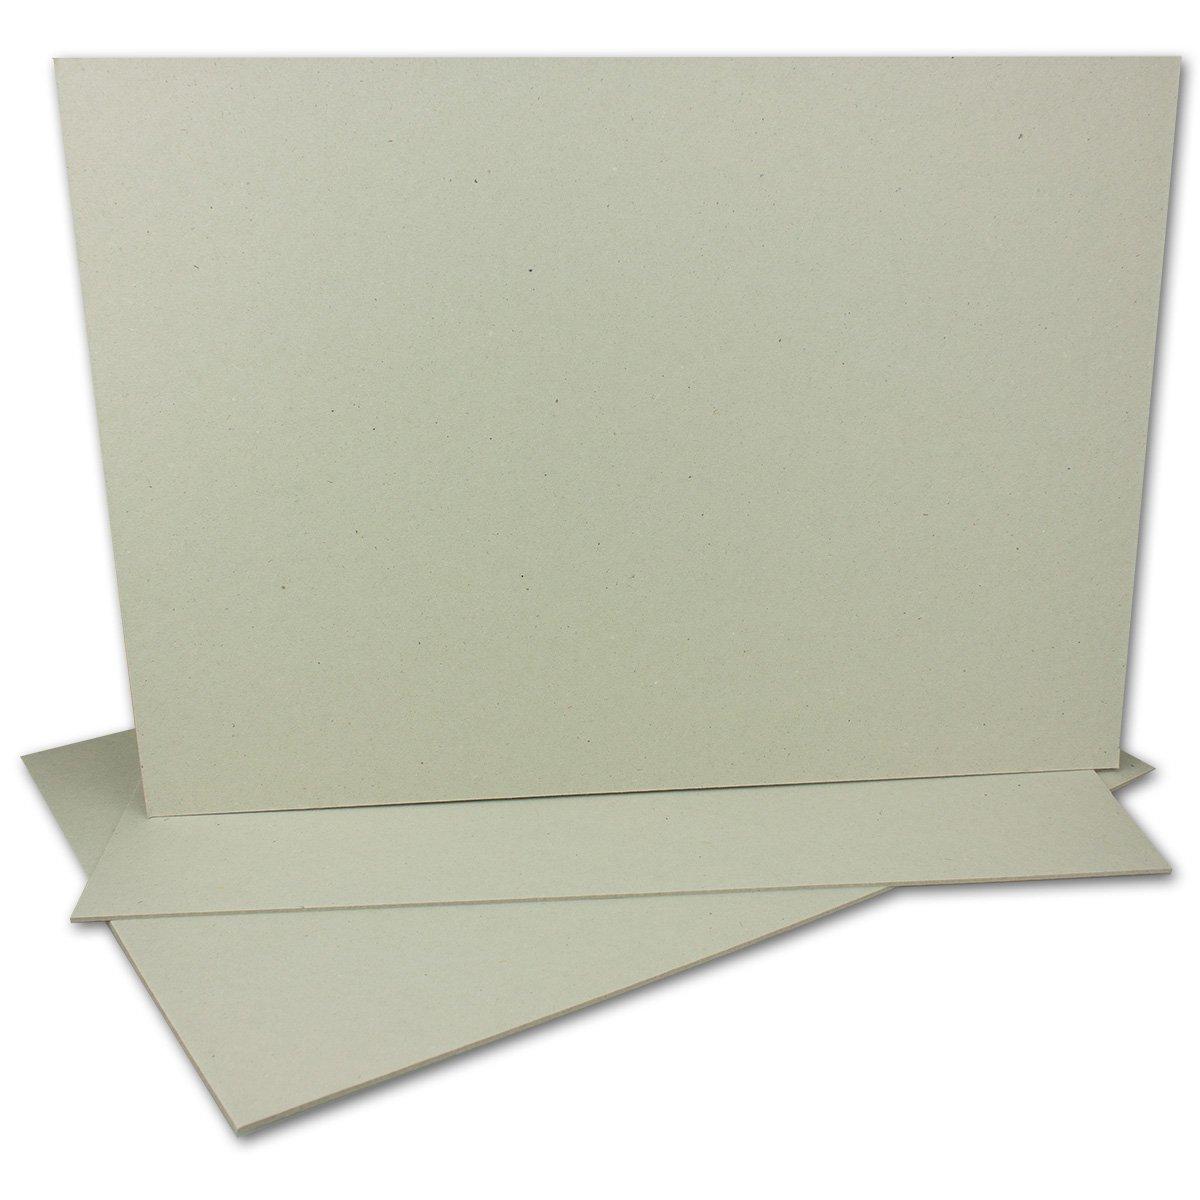 10 St/ück Farbe: Grau-Braun St/ärke 2,0 mm Format: 29,7 x 21,0 cm Grammatur: 1230 g//m/² 10 St/ück Buchbinderpappe DIN A4